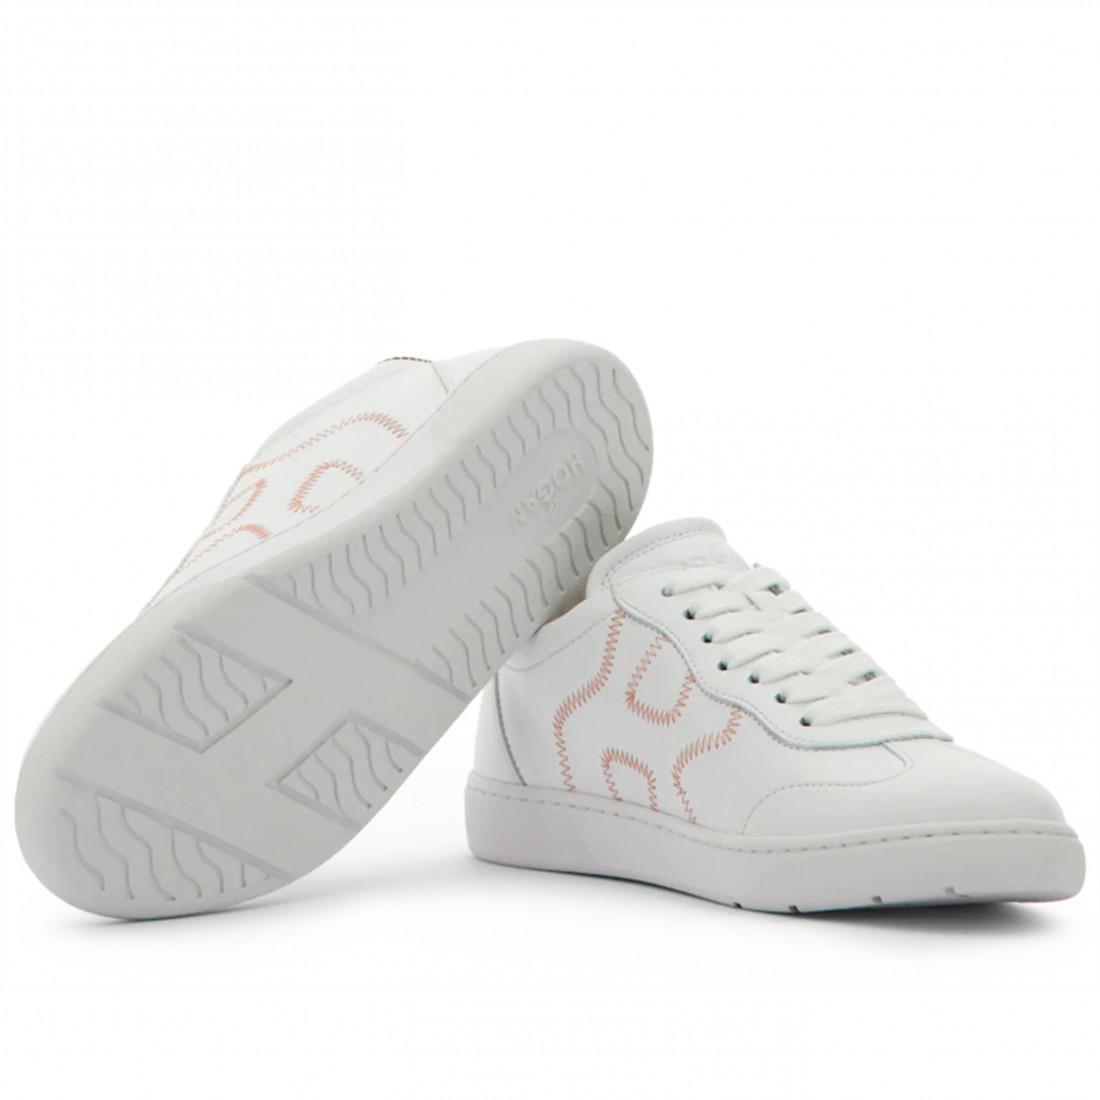 sneakers donna hogan hxw3270dn40pu80srn 8109